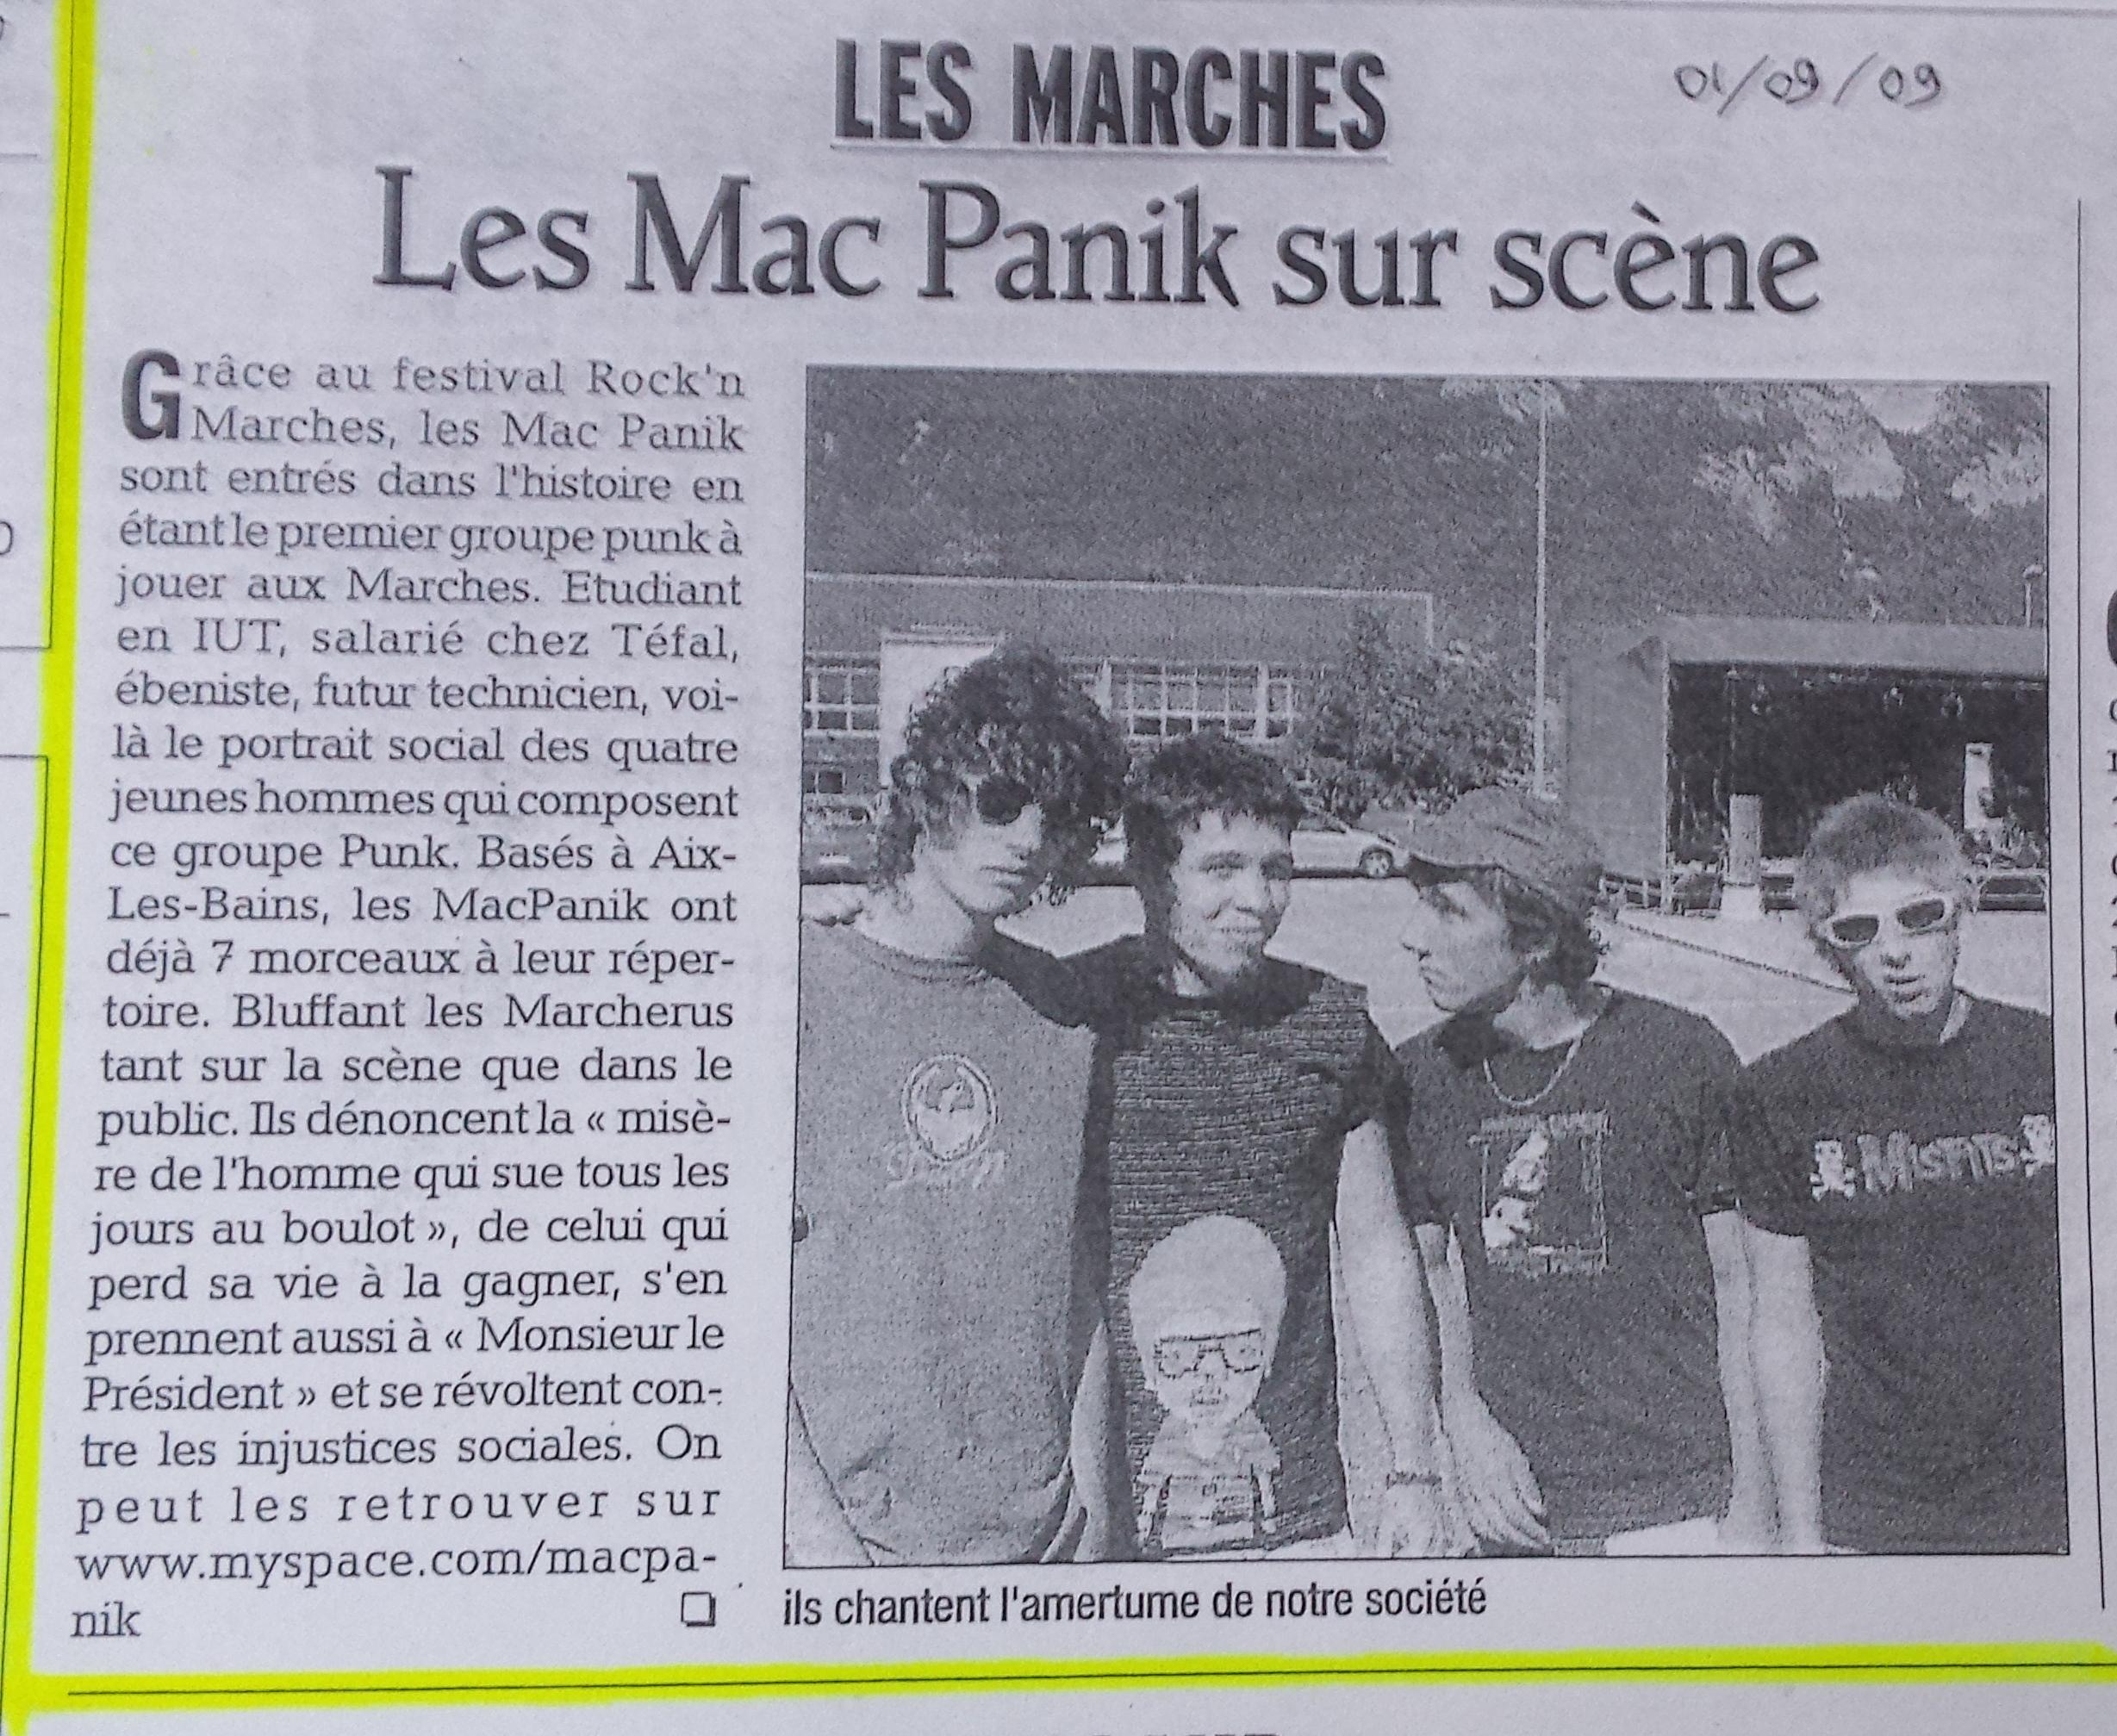 Article DL_2009-09-01_photo.jpg